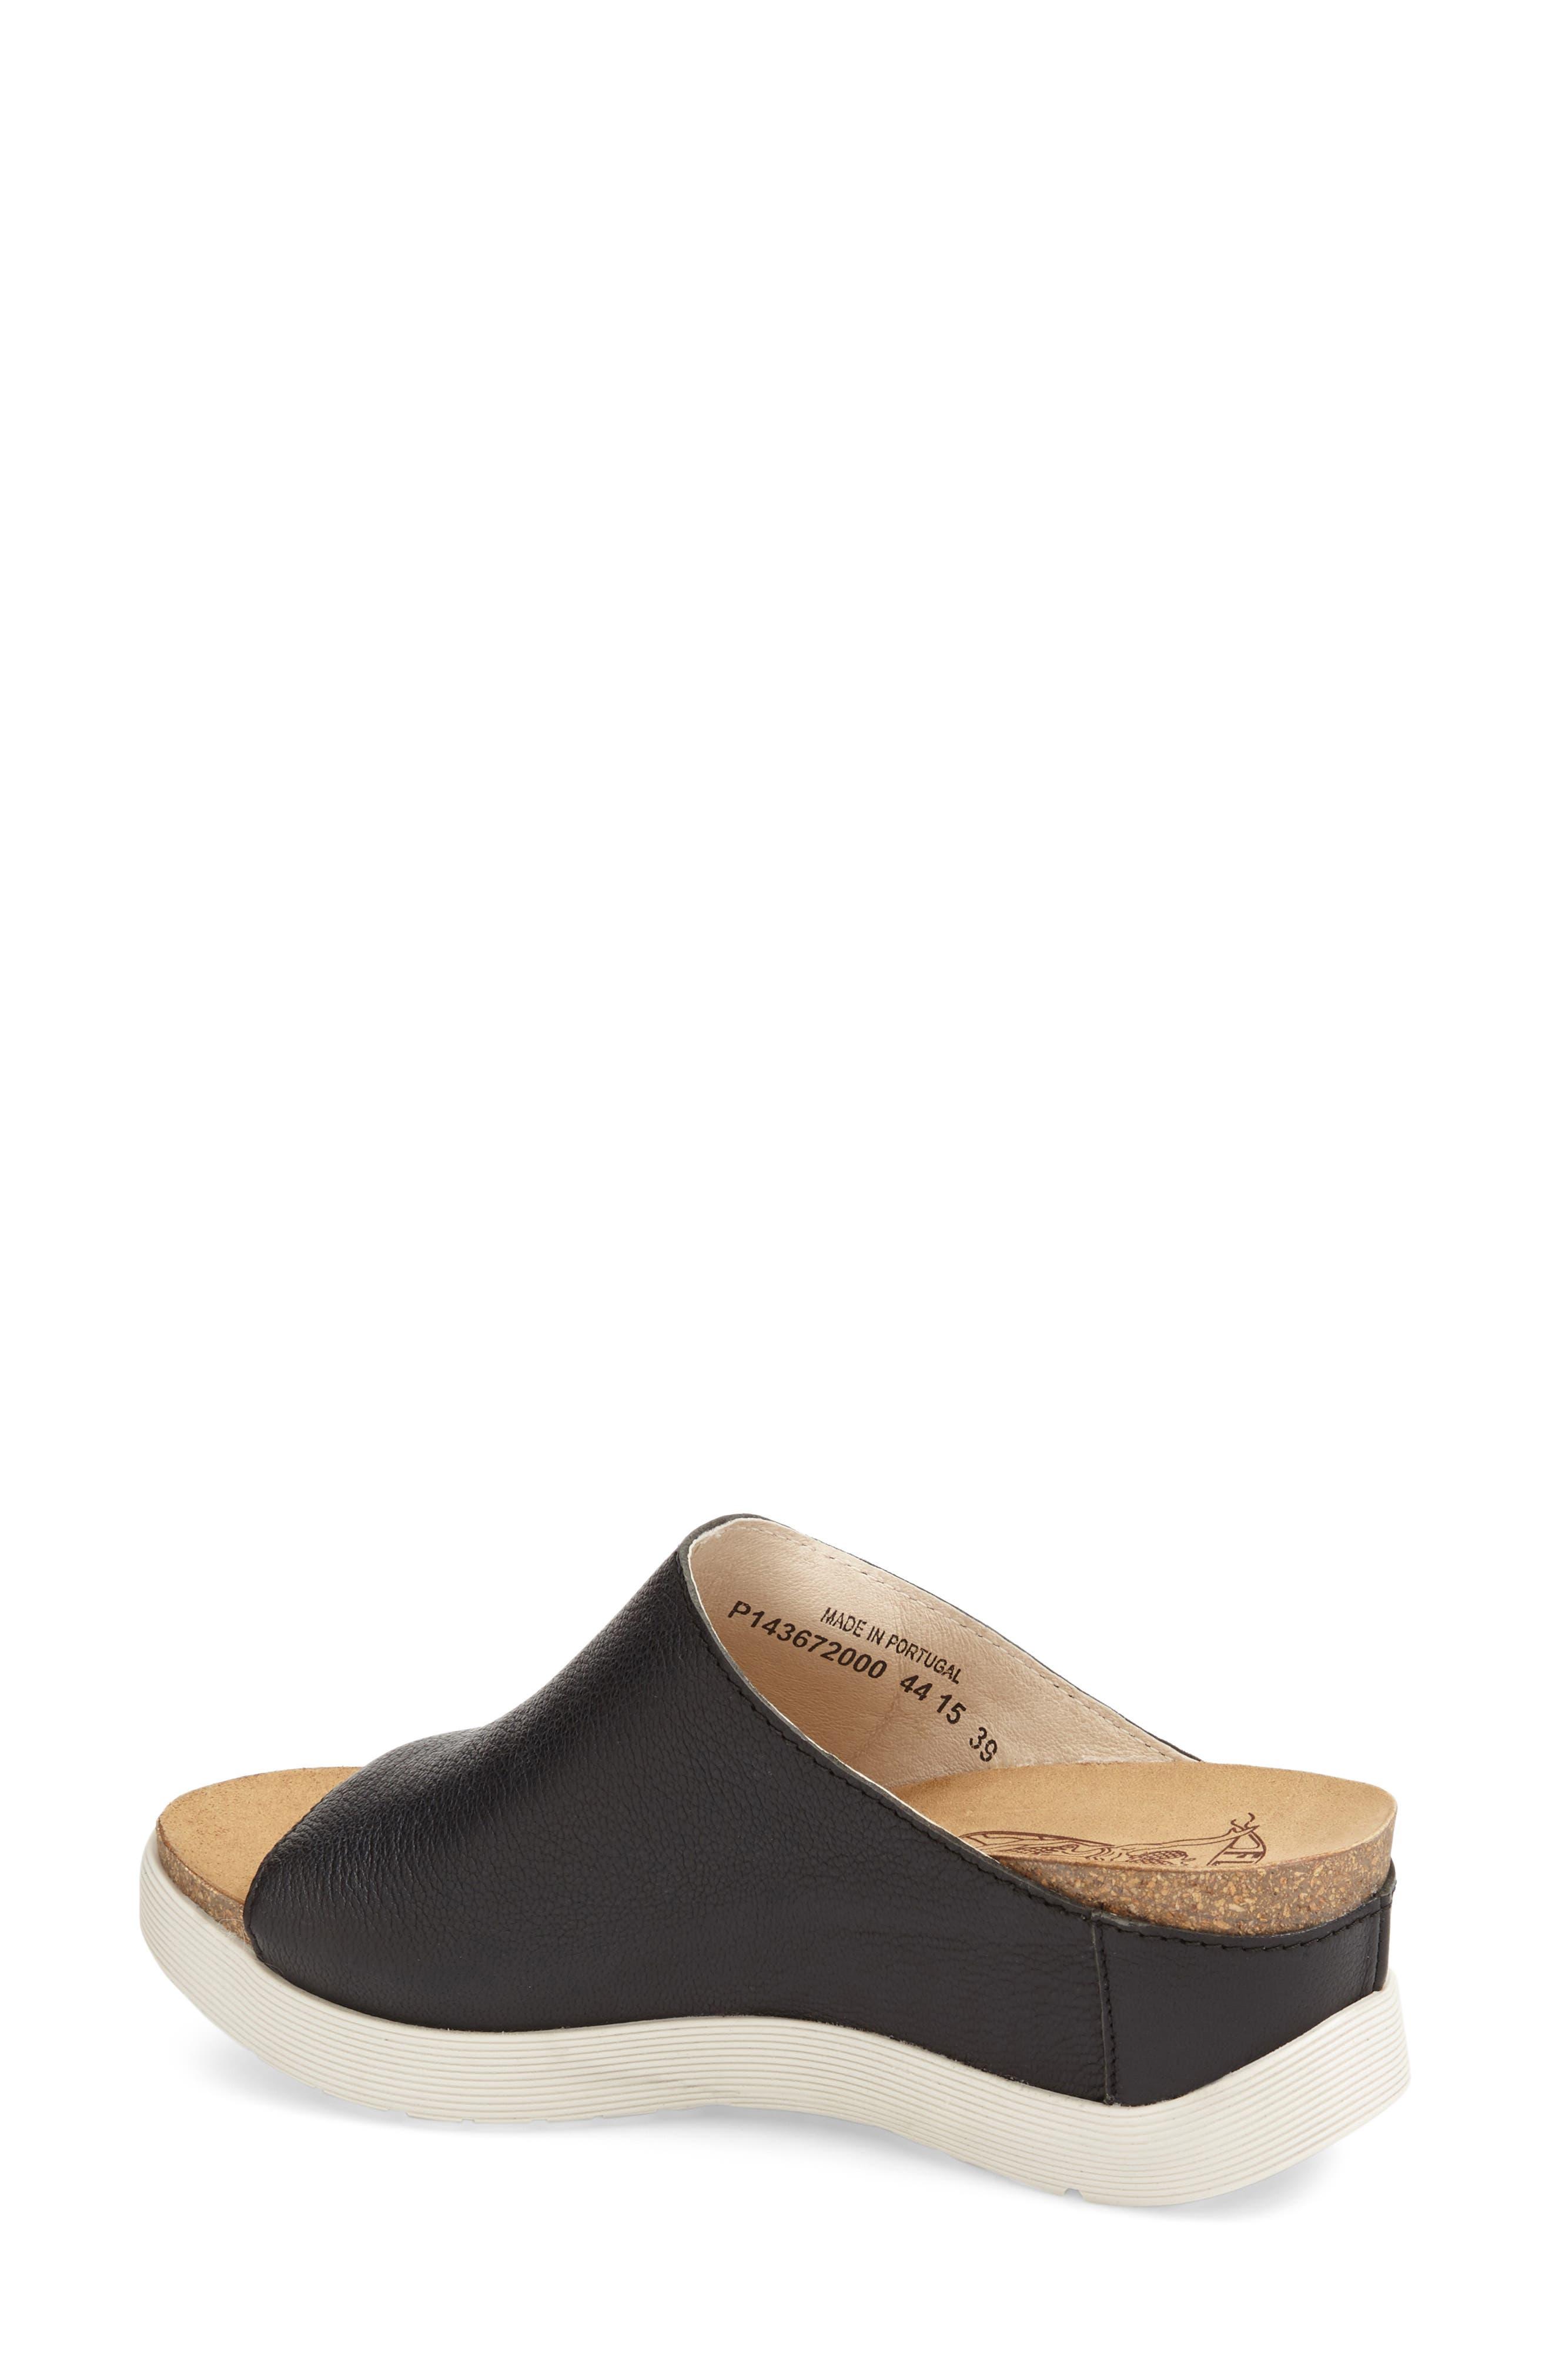 FLY LONDON, 'Wigg' Platform Wedge Slide Sandal, Main thumbnail 1, color, BLACK LEATHER